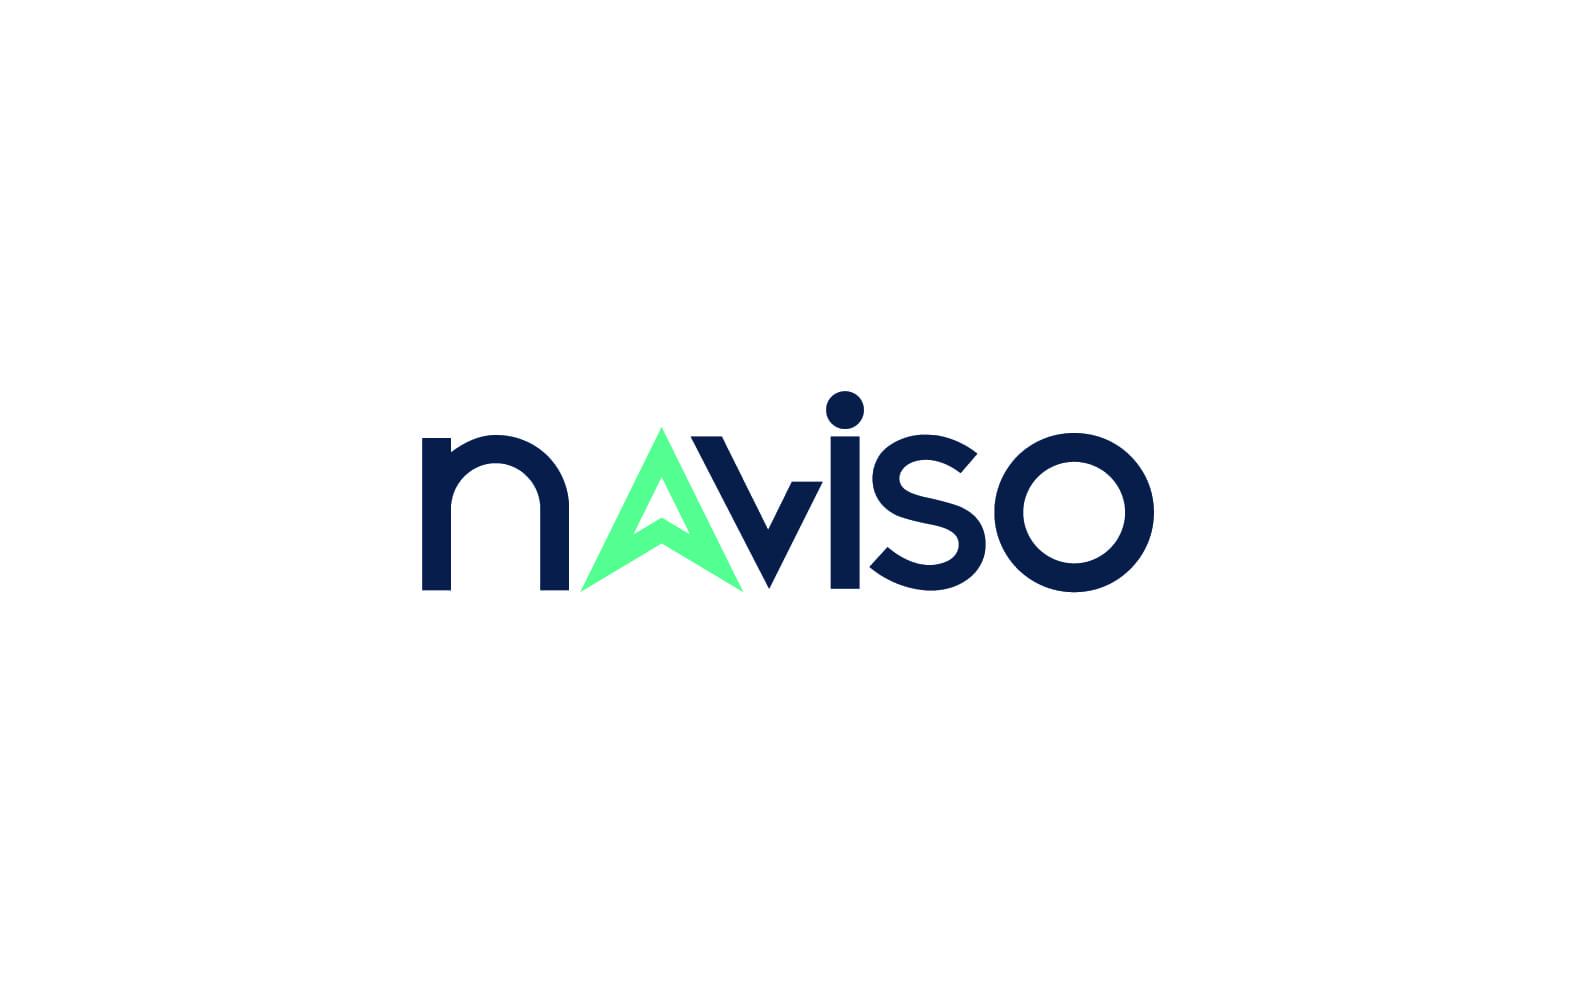 Naviso logo